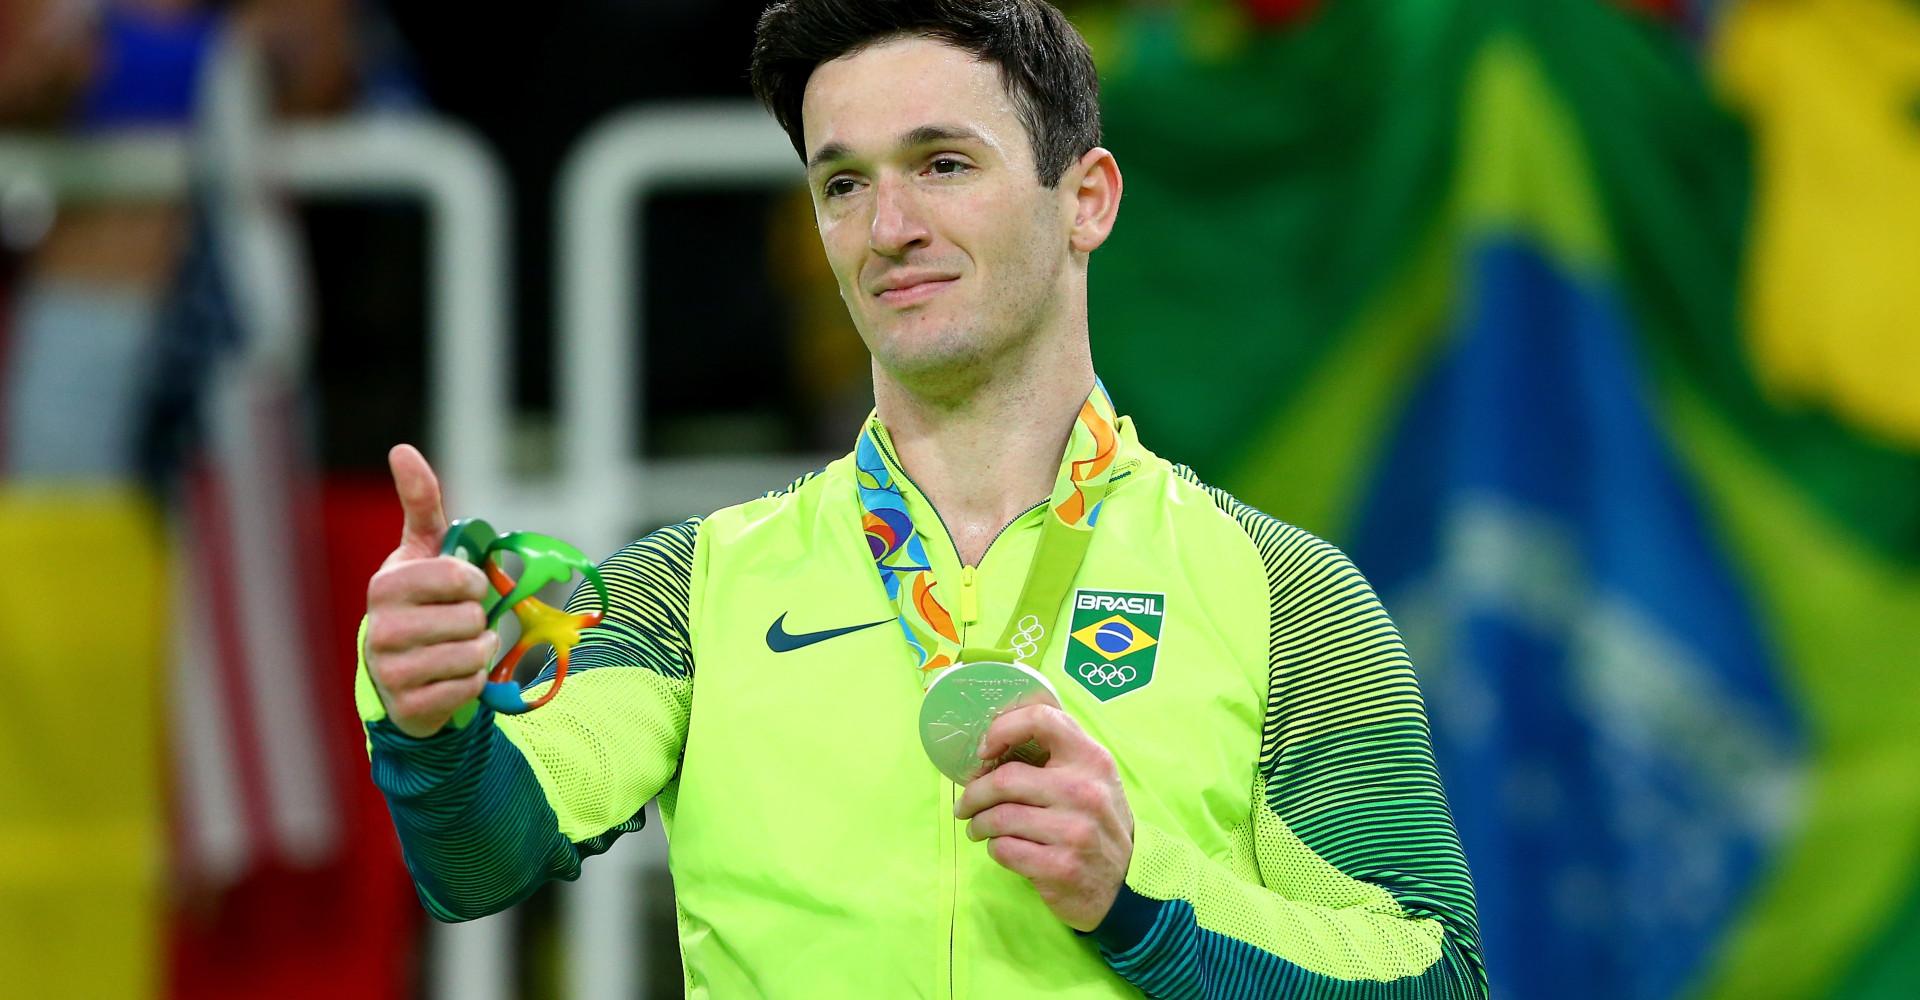 82 atletas brasileiros e internacionais que se assumiram LGBT